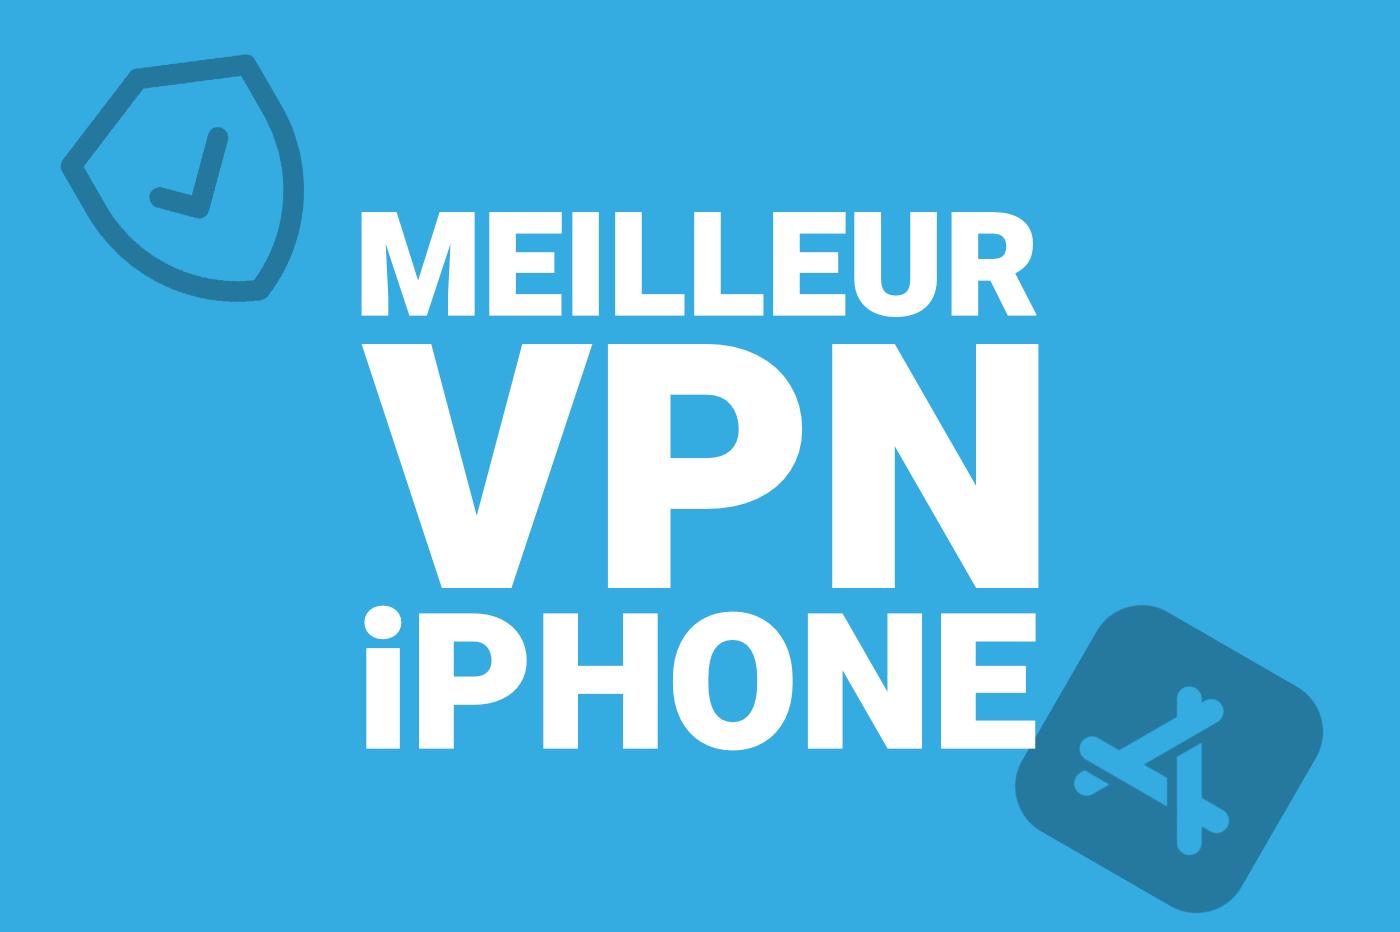 Meilleurs VPN iPhone